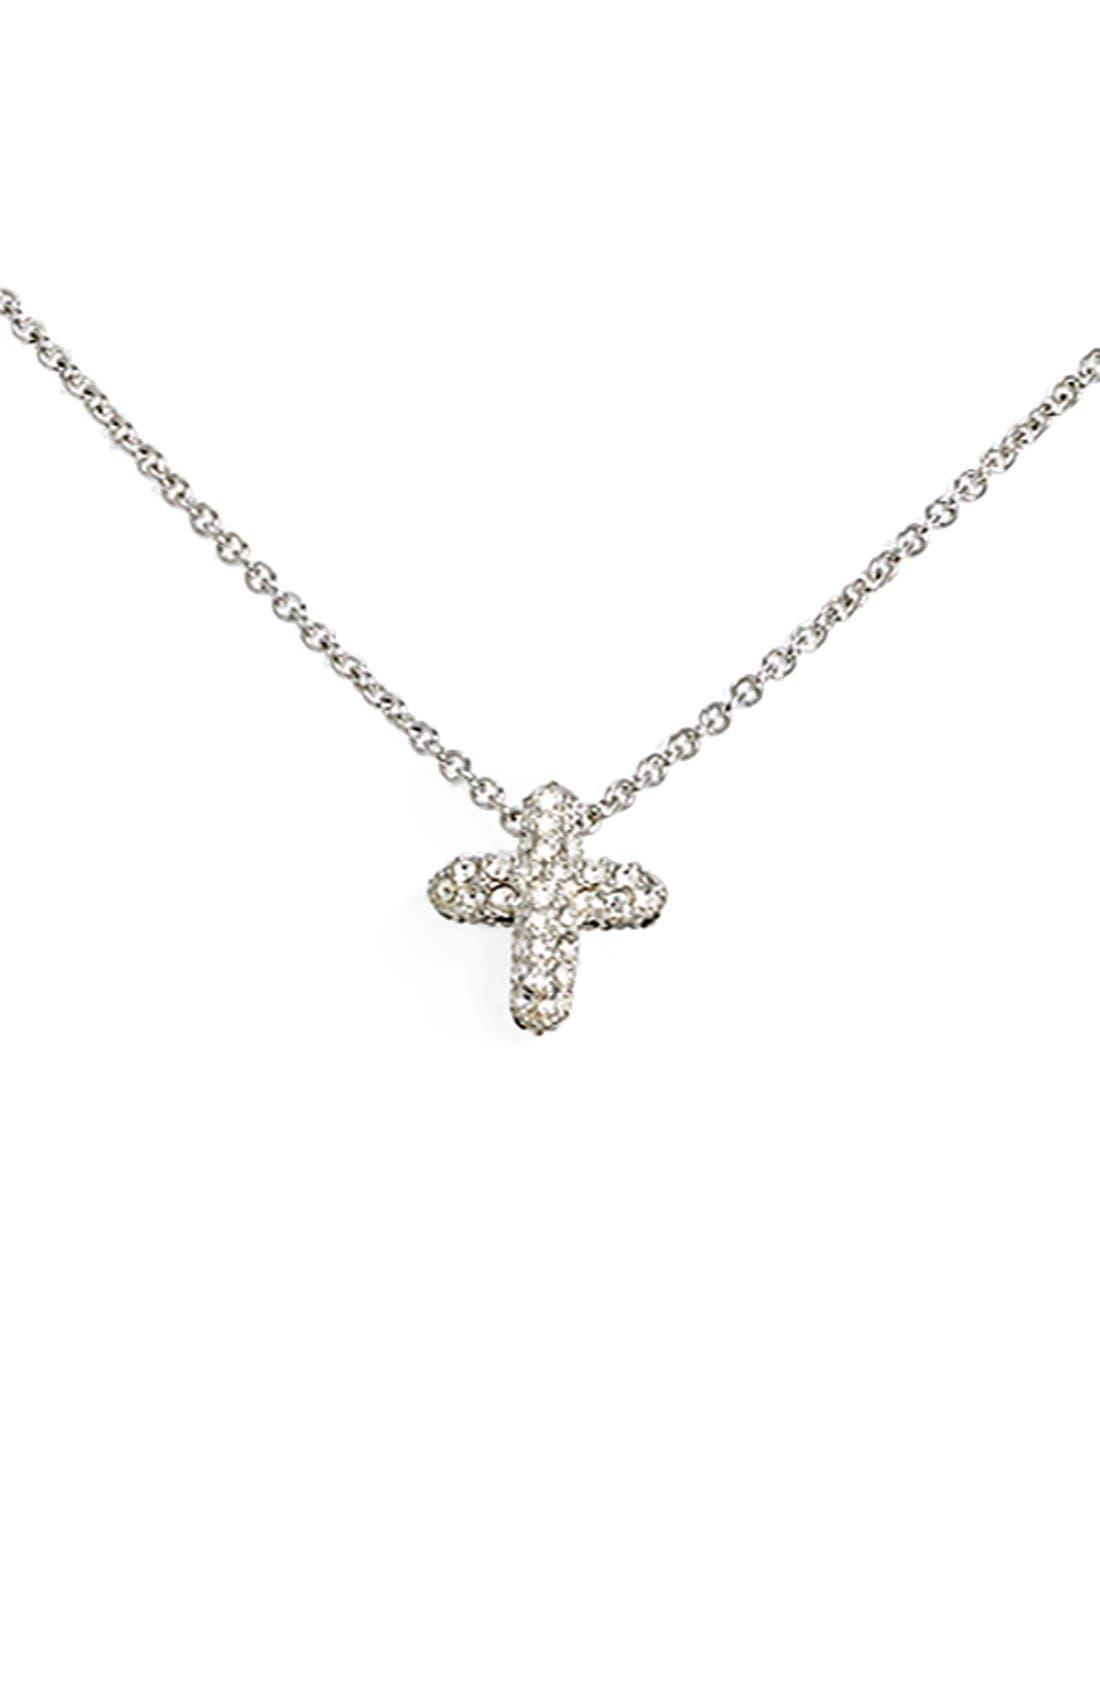 Main Image - Judith Jack Reversible Pavé Cross Pendant Necklace